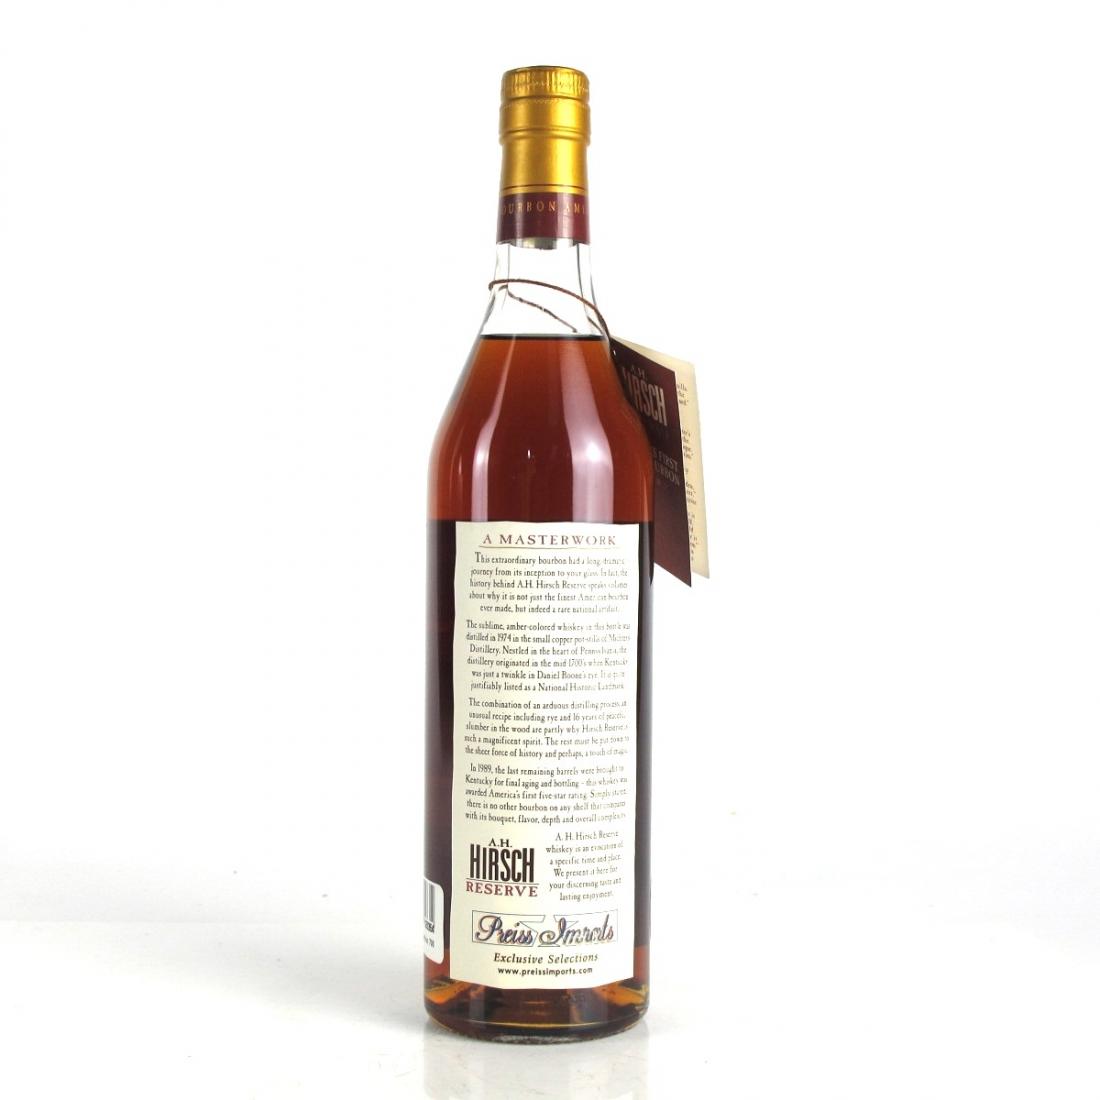 Hirsch Reserve 1974 16 Year Old Bourbon / 2003 Release